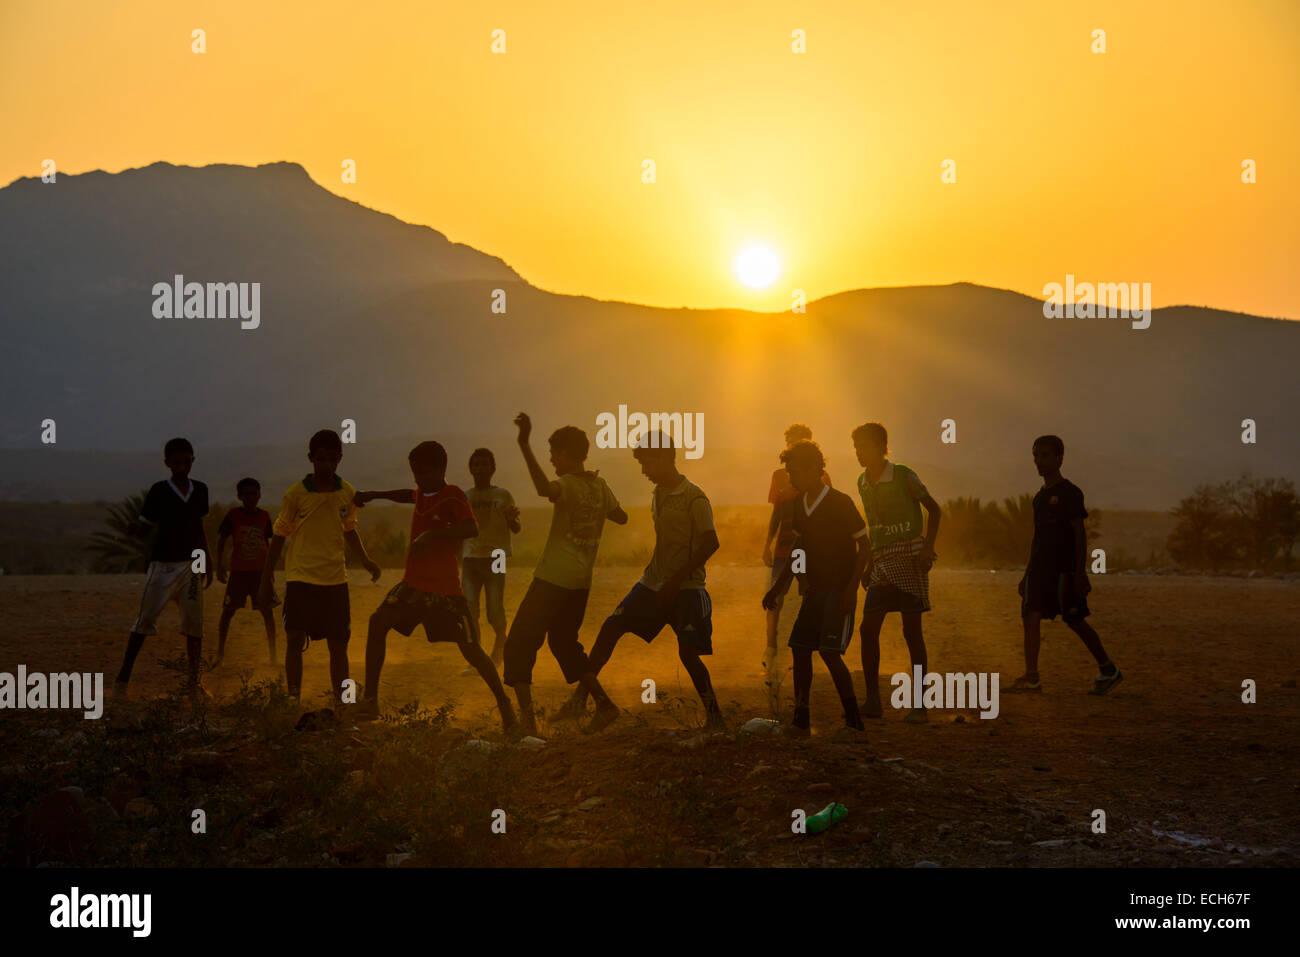 Boys playing soccer, Socotra, Yemen - Stock Image